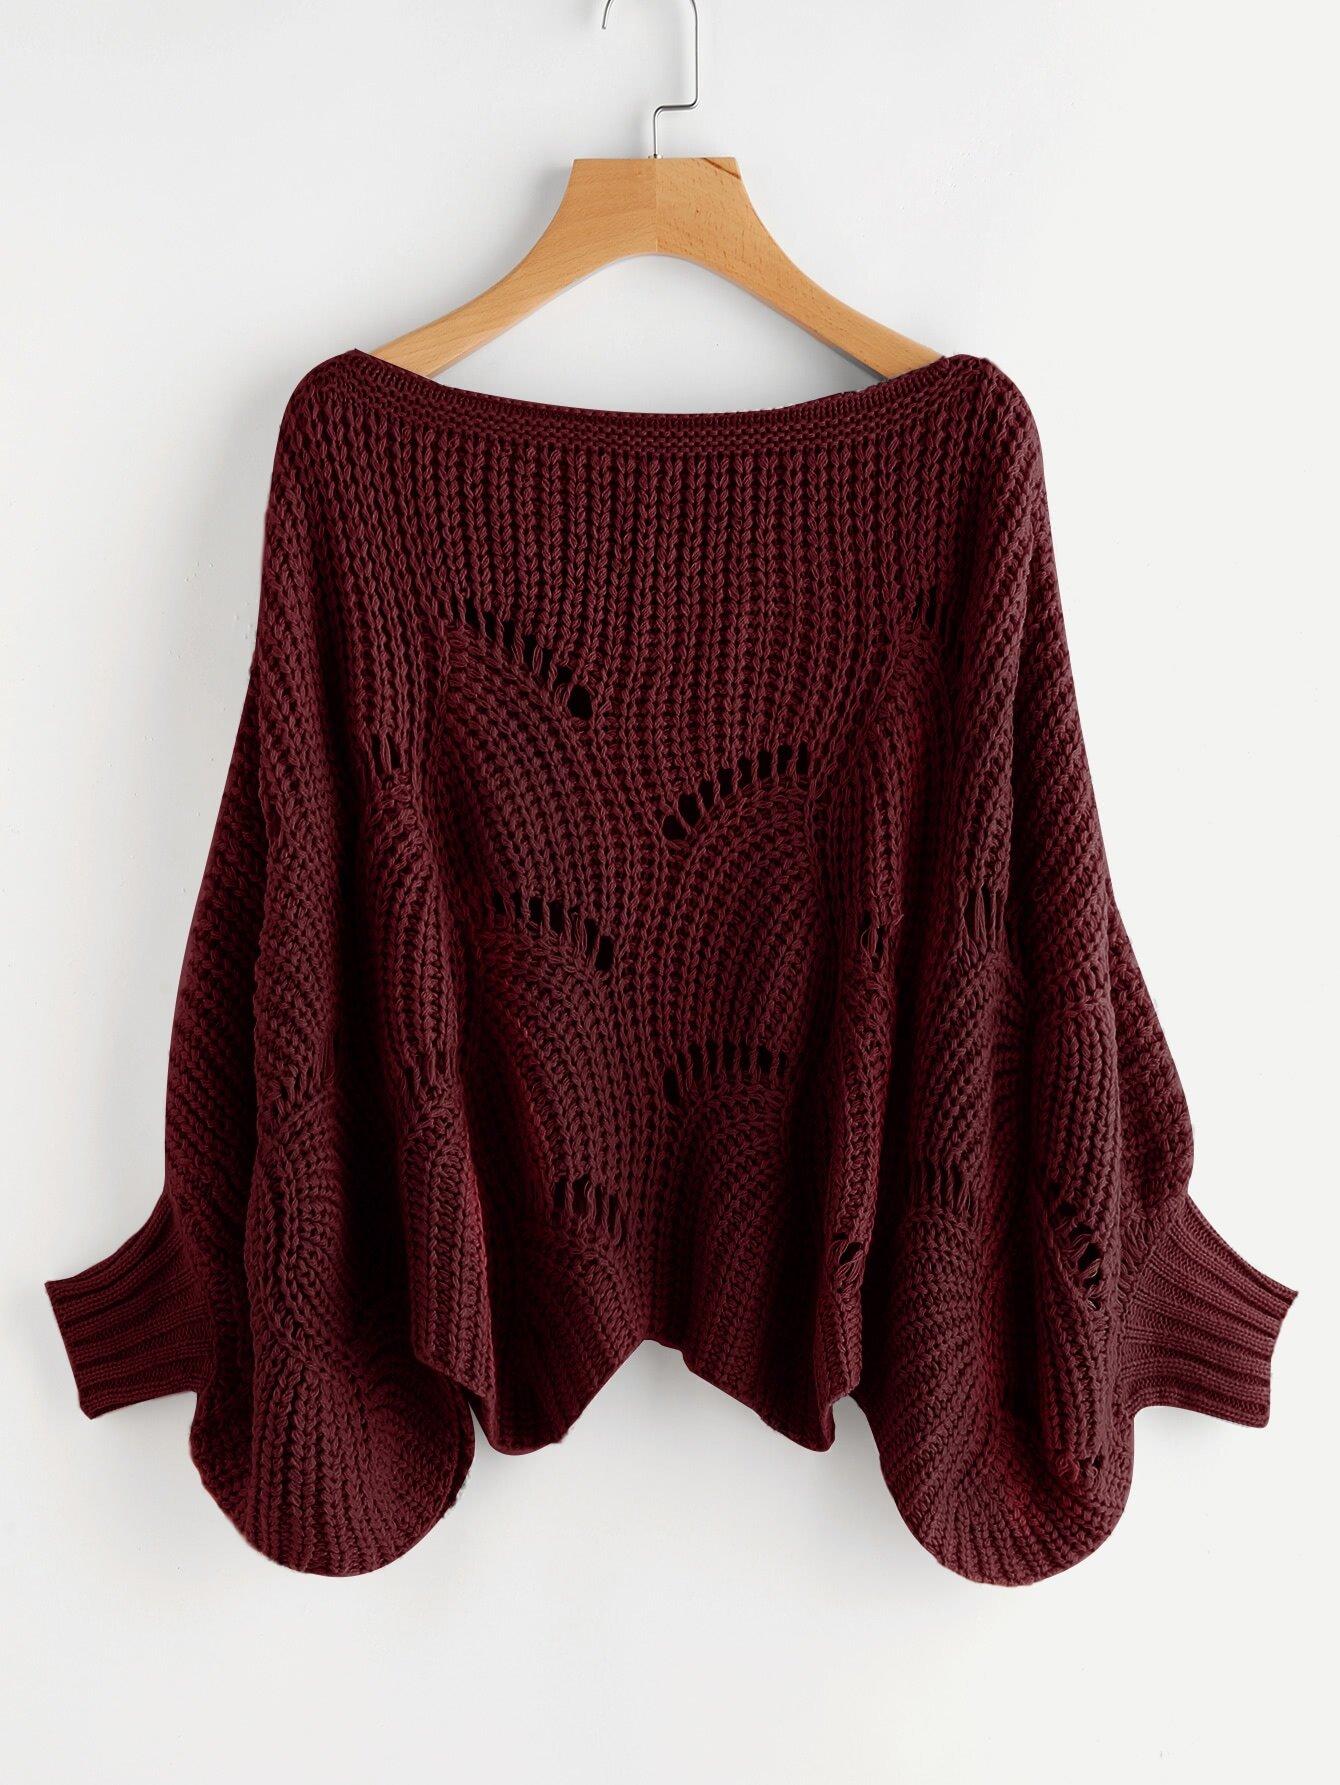 Eyelet Dolman Sleeve Jumper sweater170821453